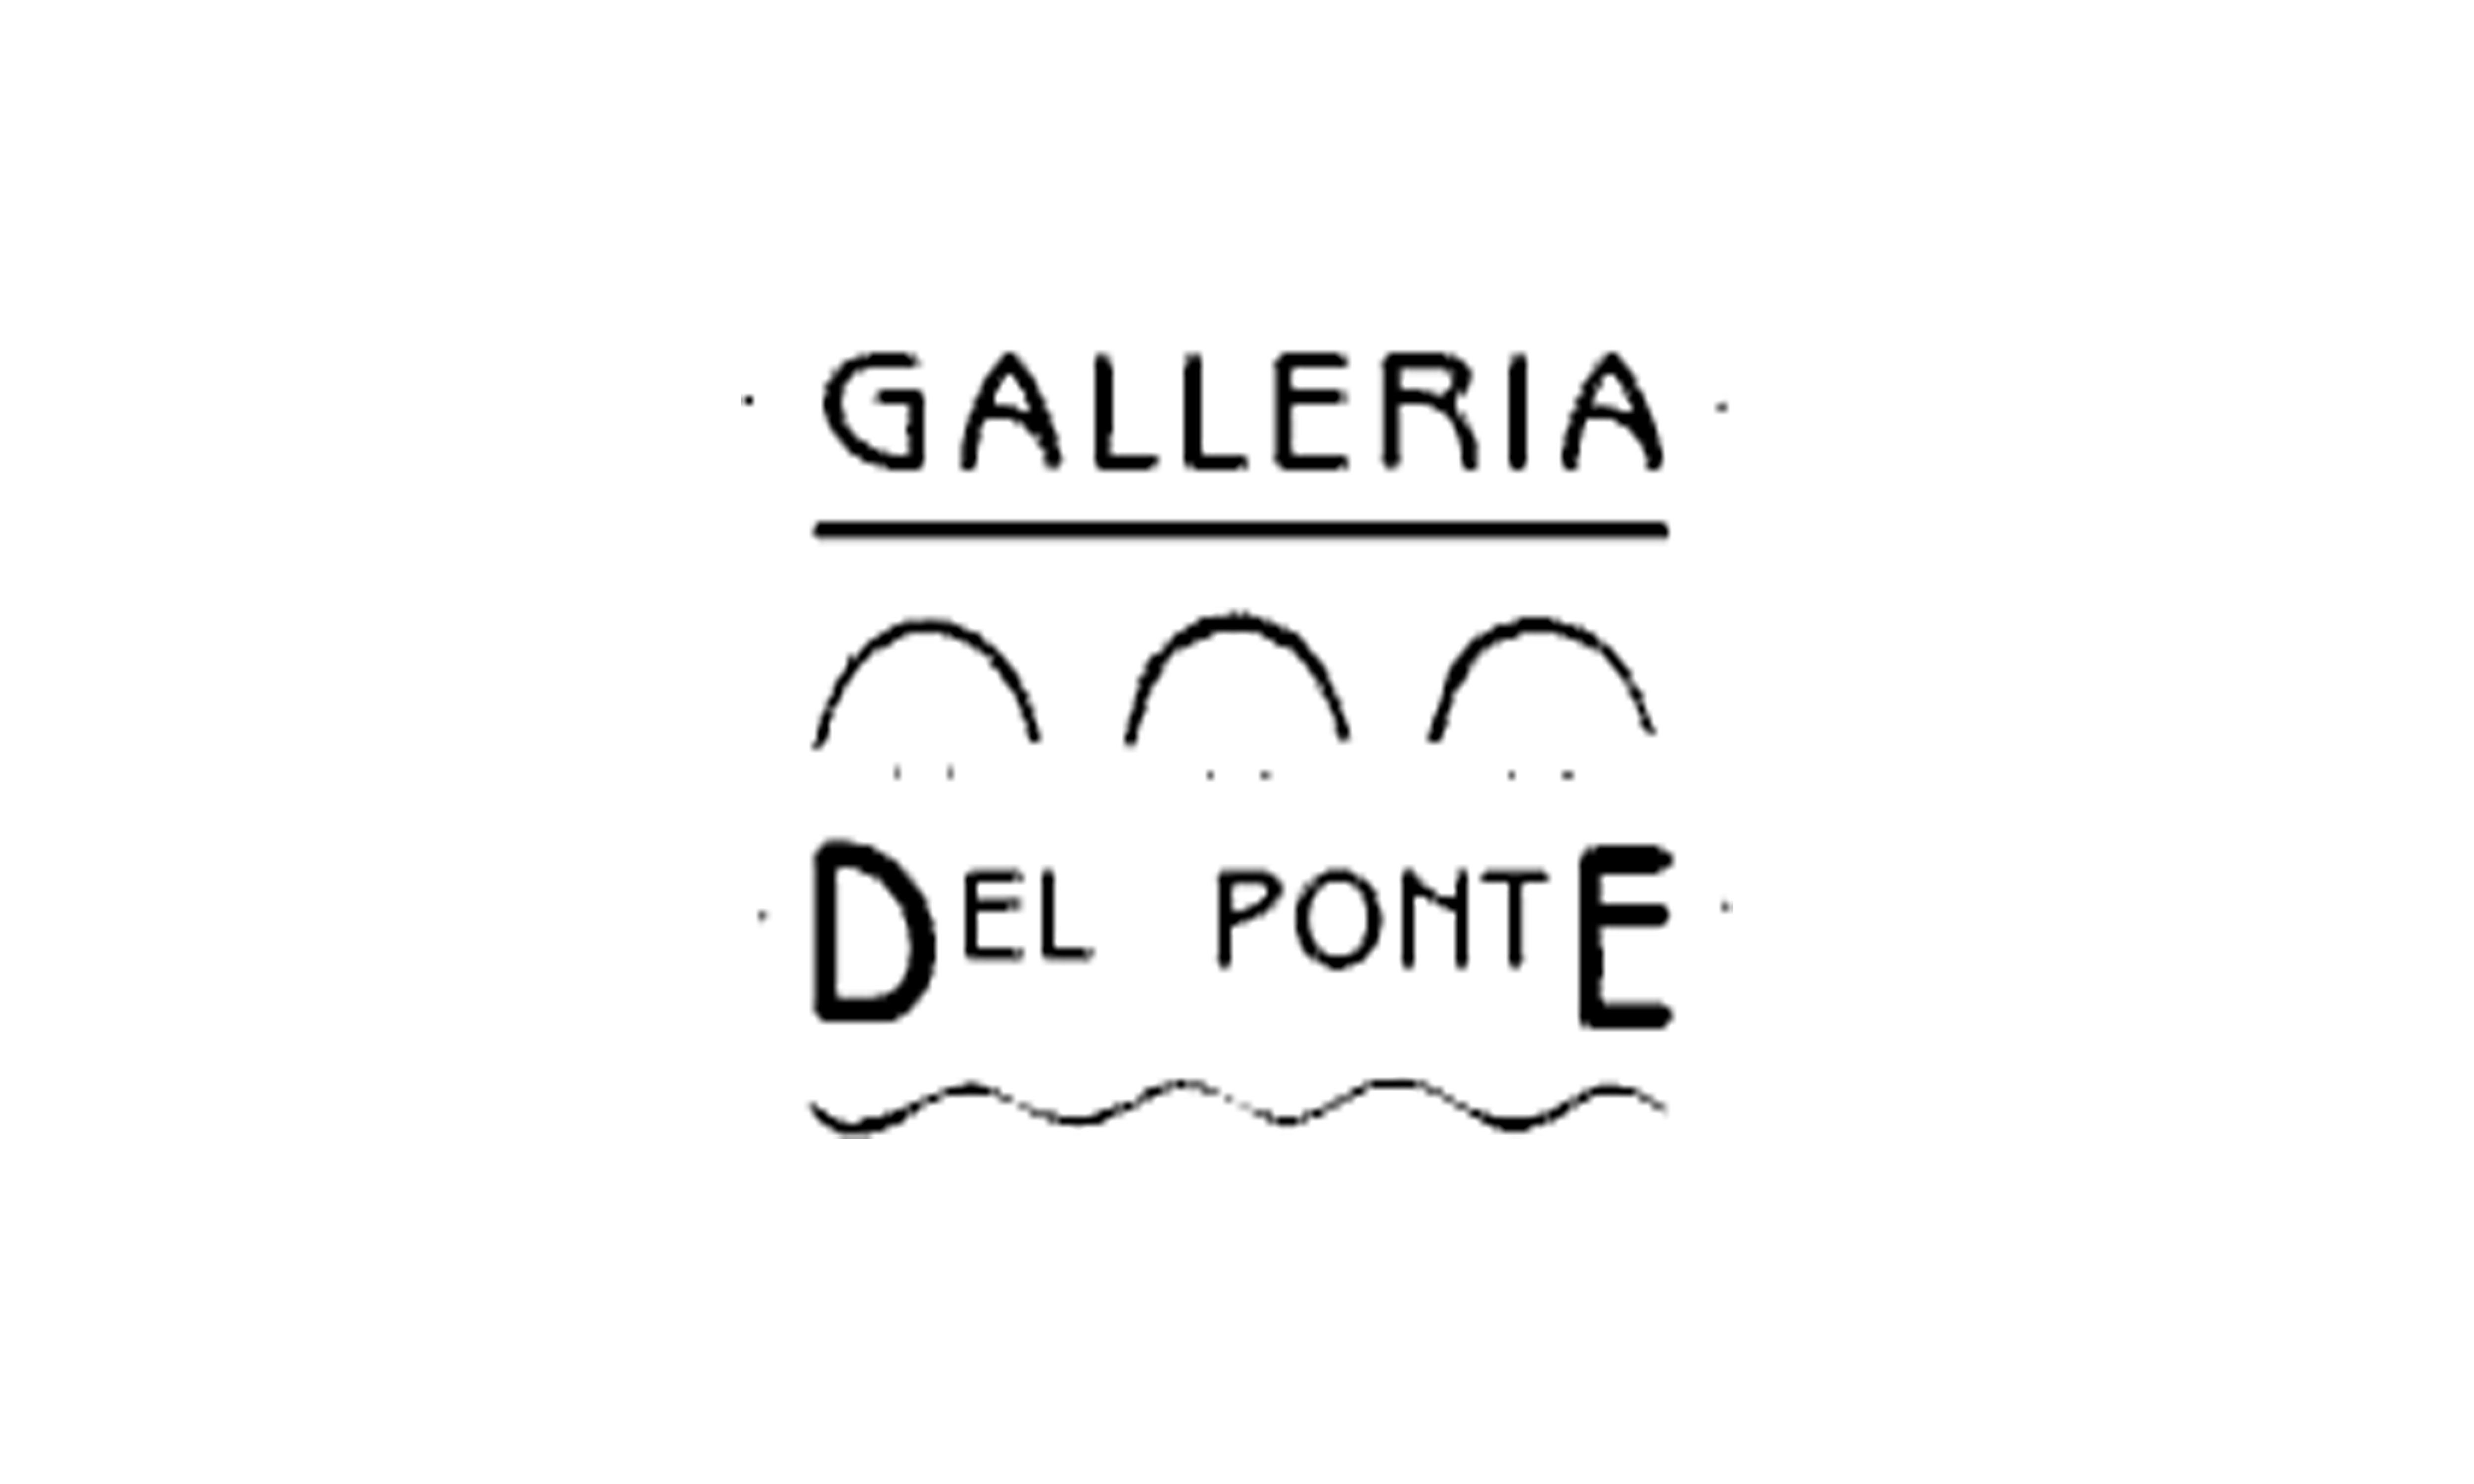 Galleria del Ponte sas